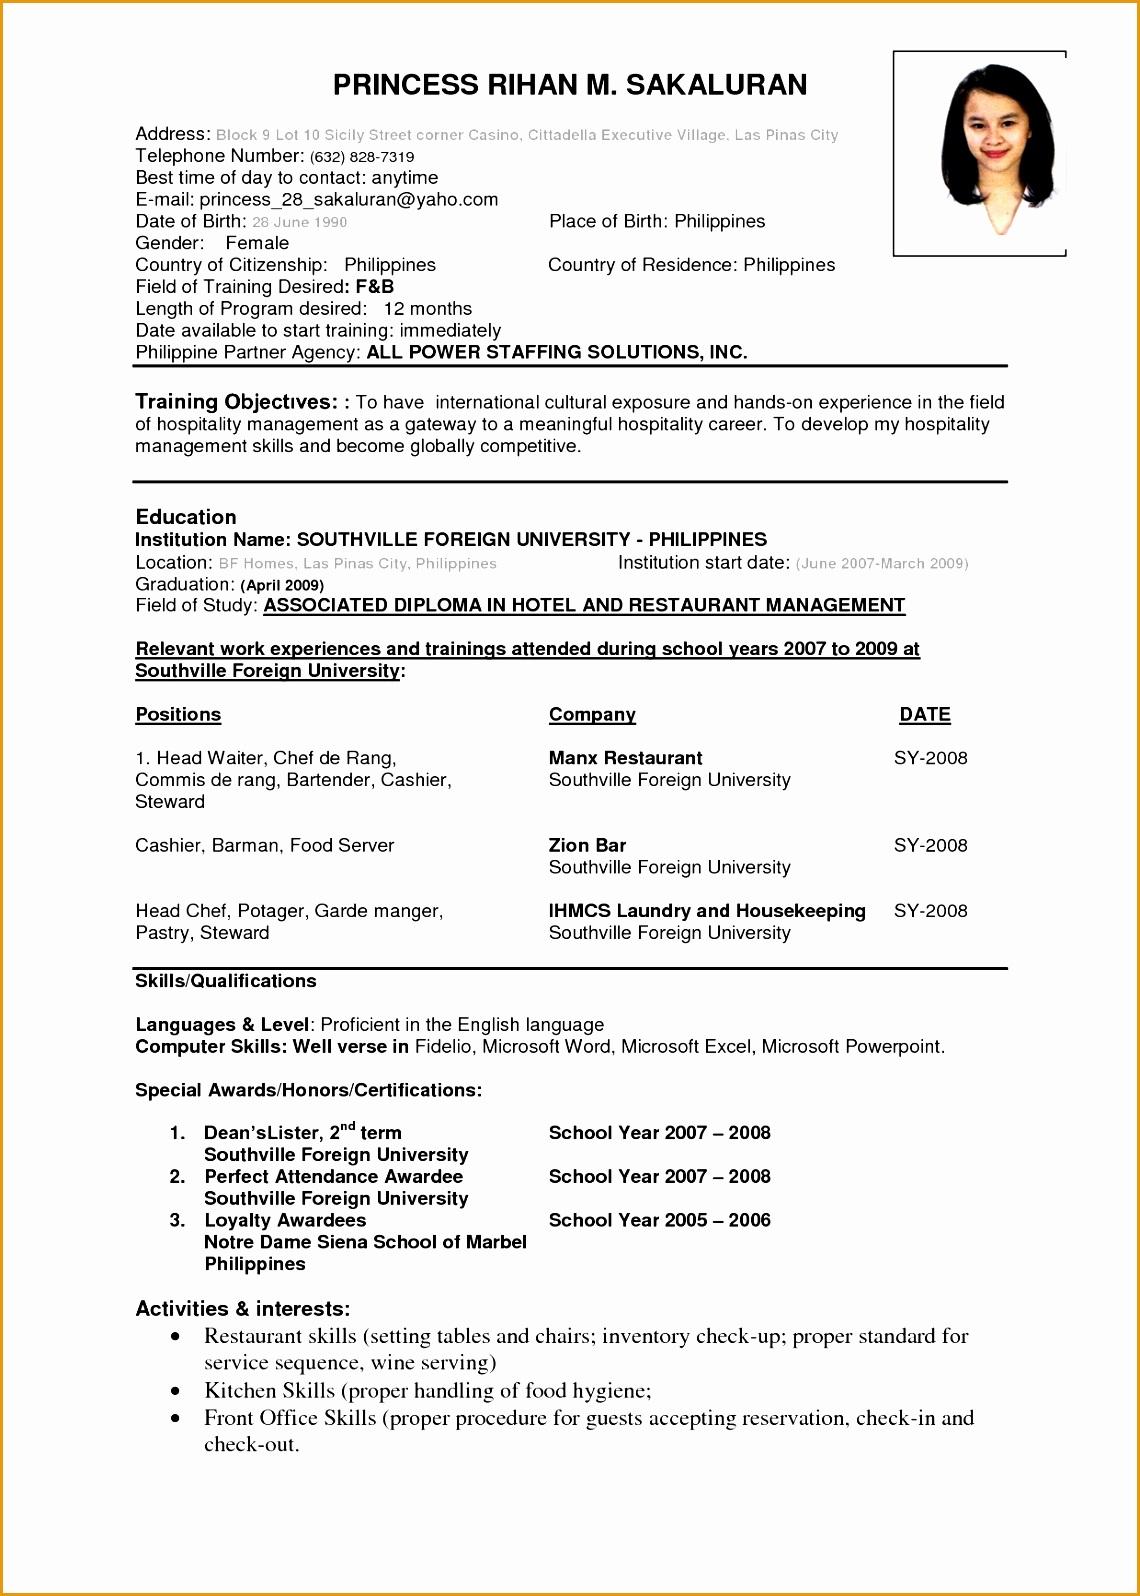 simple resume templates free sample basic resume format basic easy Resume Form Sample 1